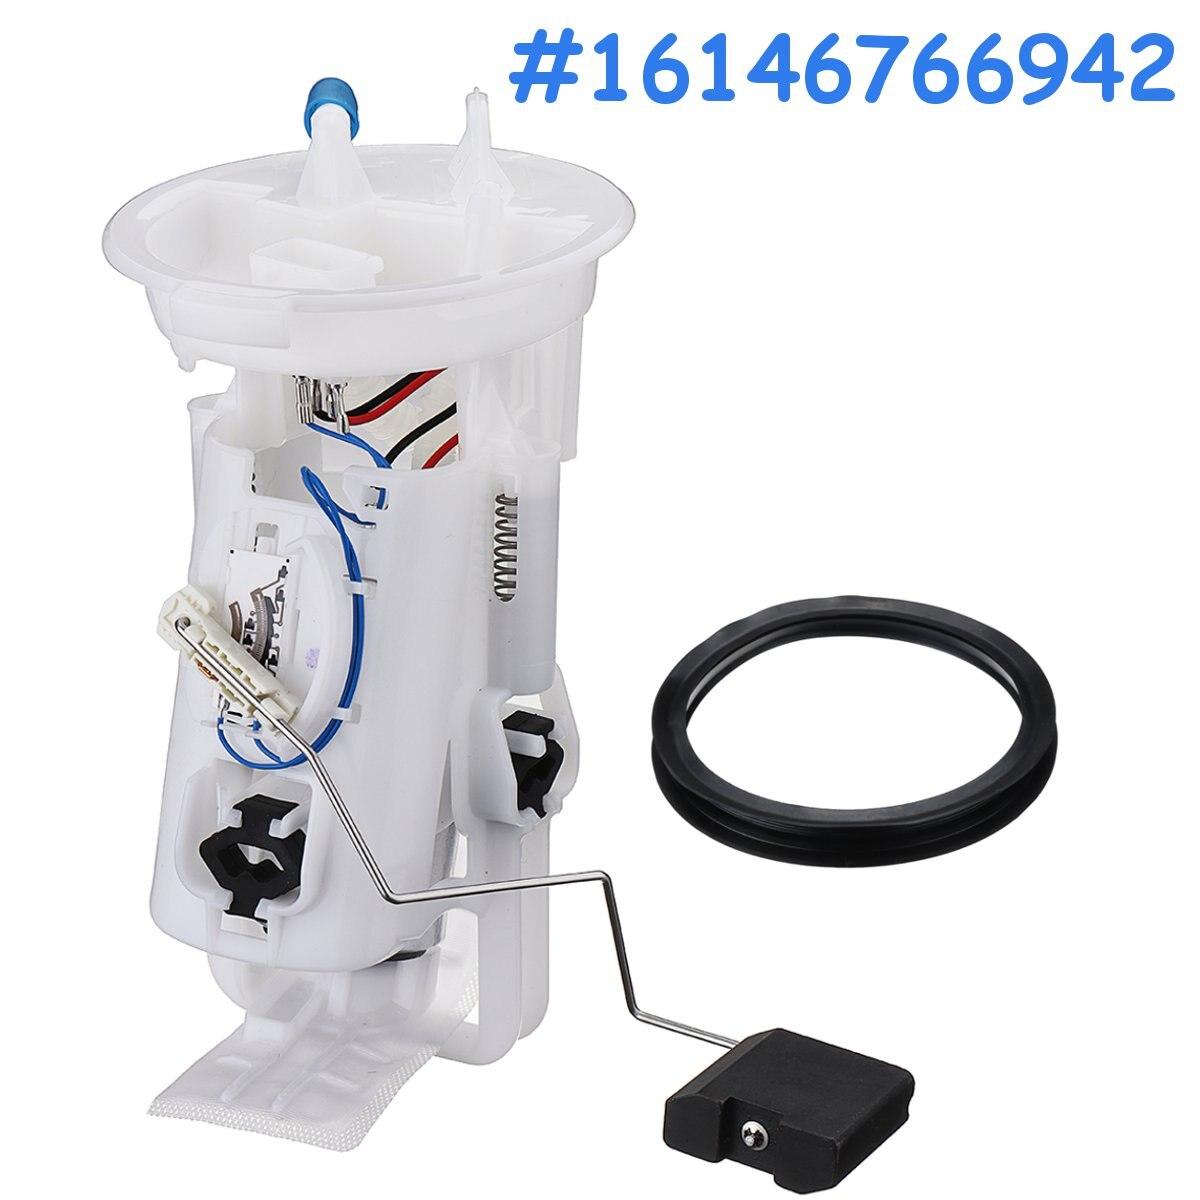 Car Fuel Pump + Sending Unit Module For BMW E46 3 Series 316i 318i 320i 323i 325i L6 6 Cyl #16146766942 bmw genuine fuel pump pre supply pump in tank suction device for 318i 325e 325i m3